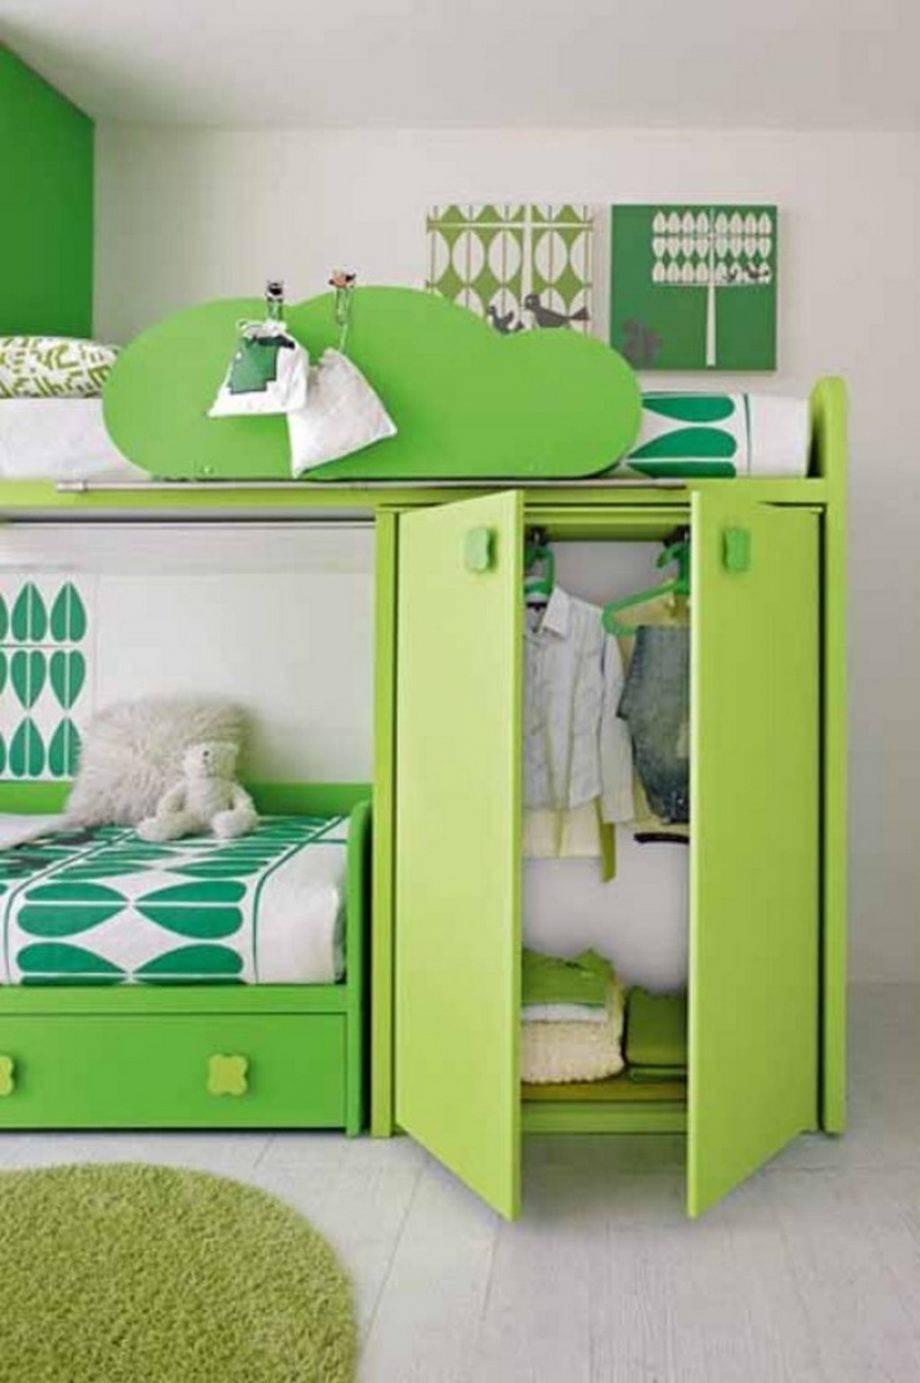 Bed Childrens Bedroom Wardrobe Ideas Designs For Of Small in Childrens Bedroom Wardrobes (Image 2 of 30)